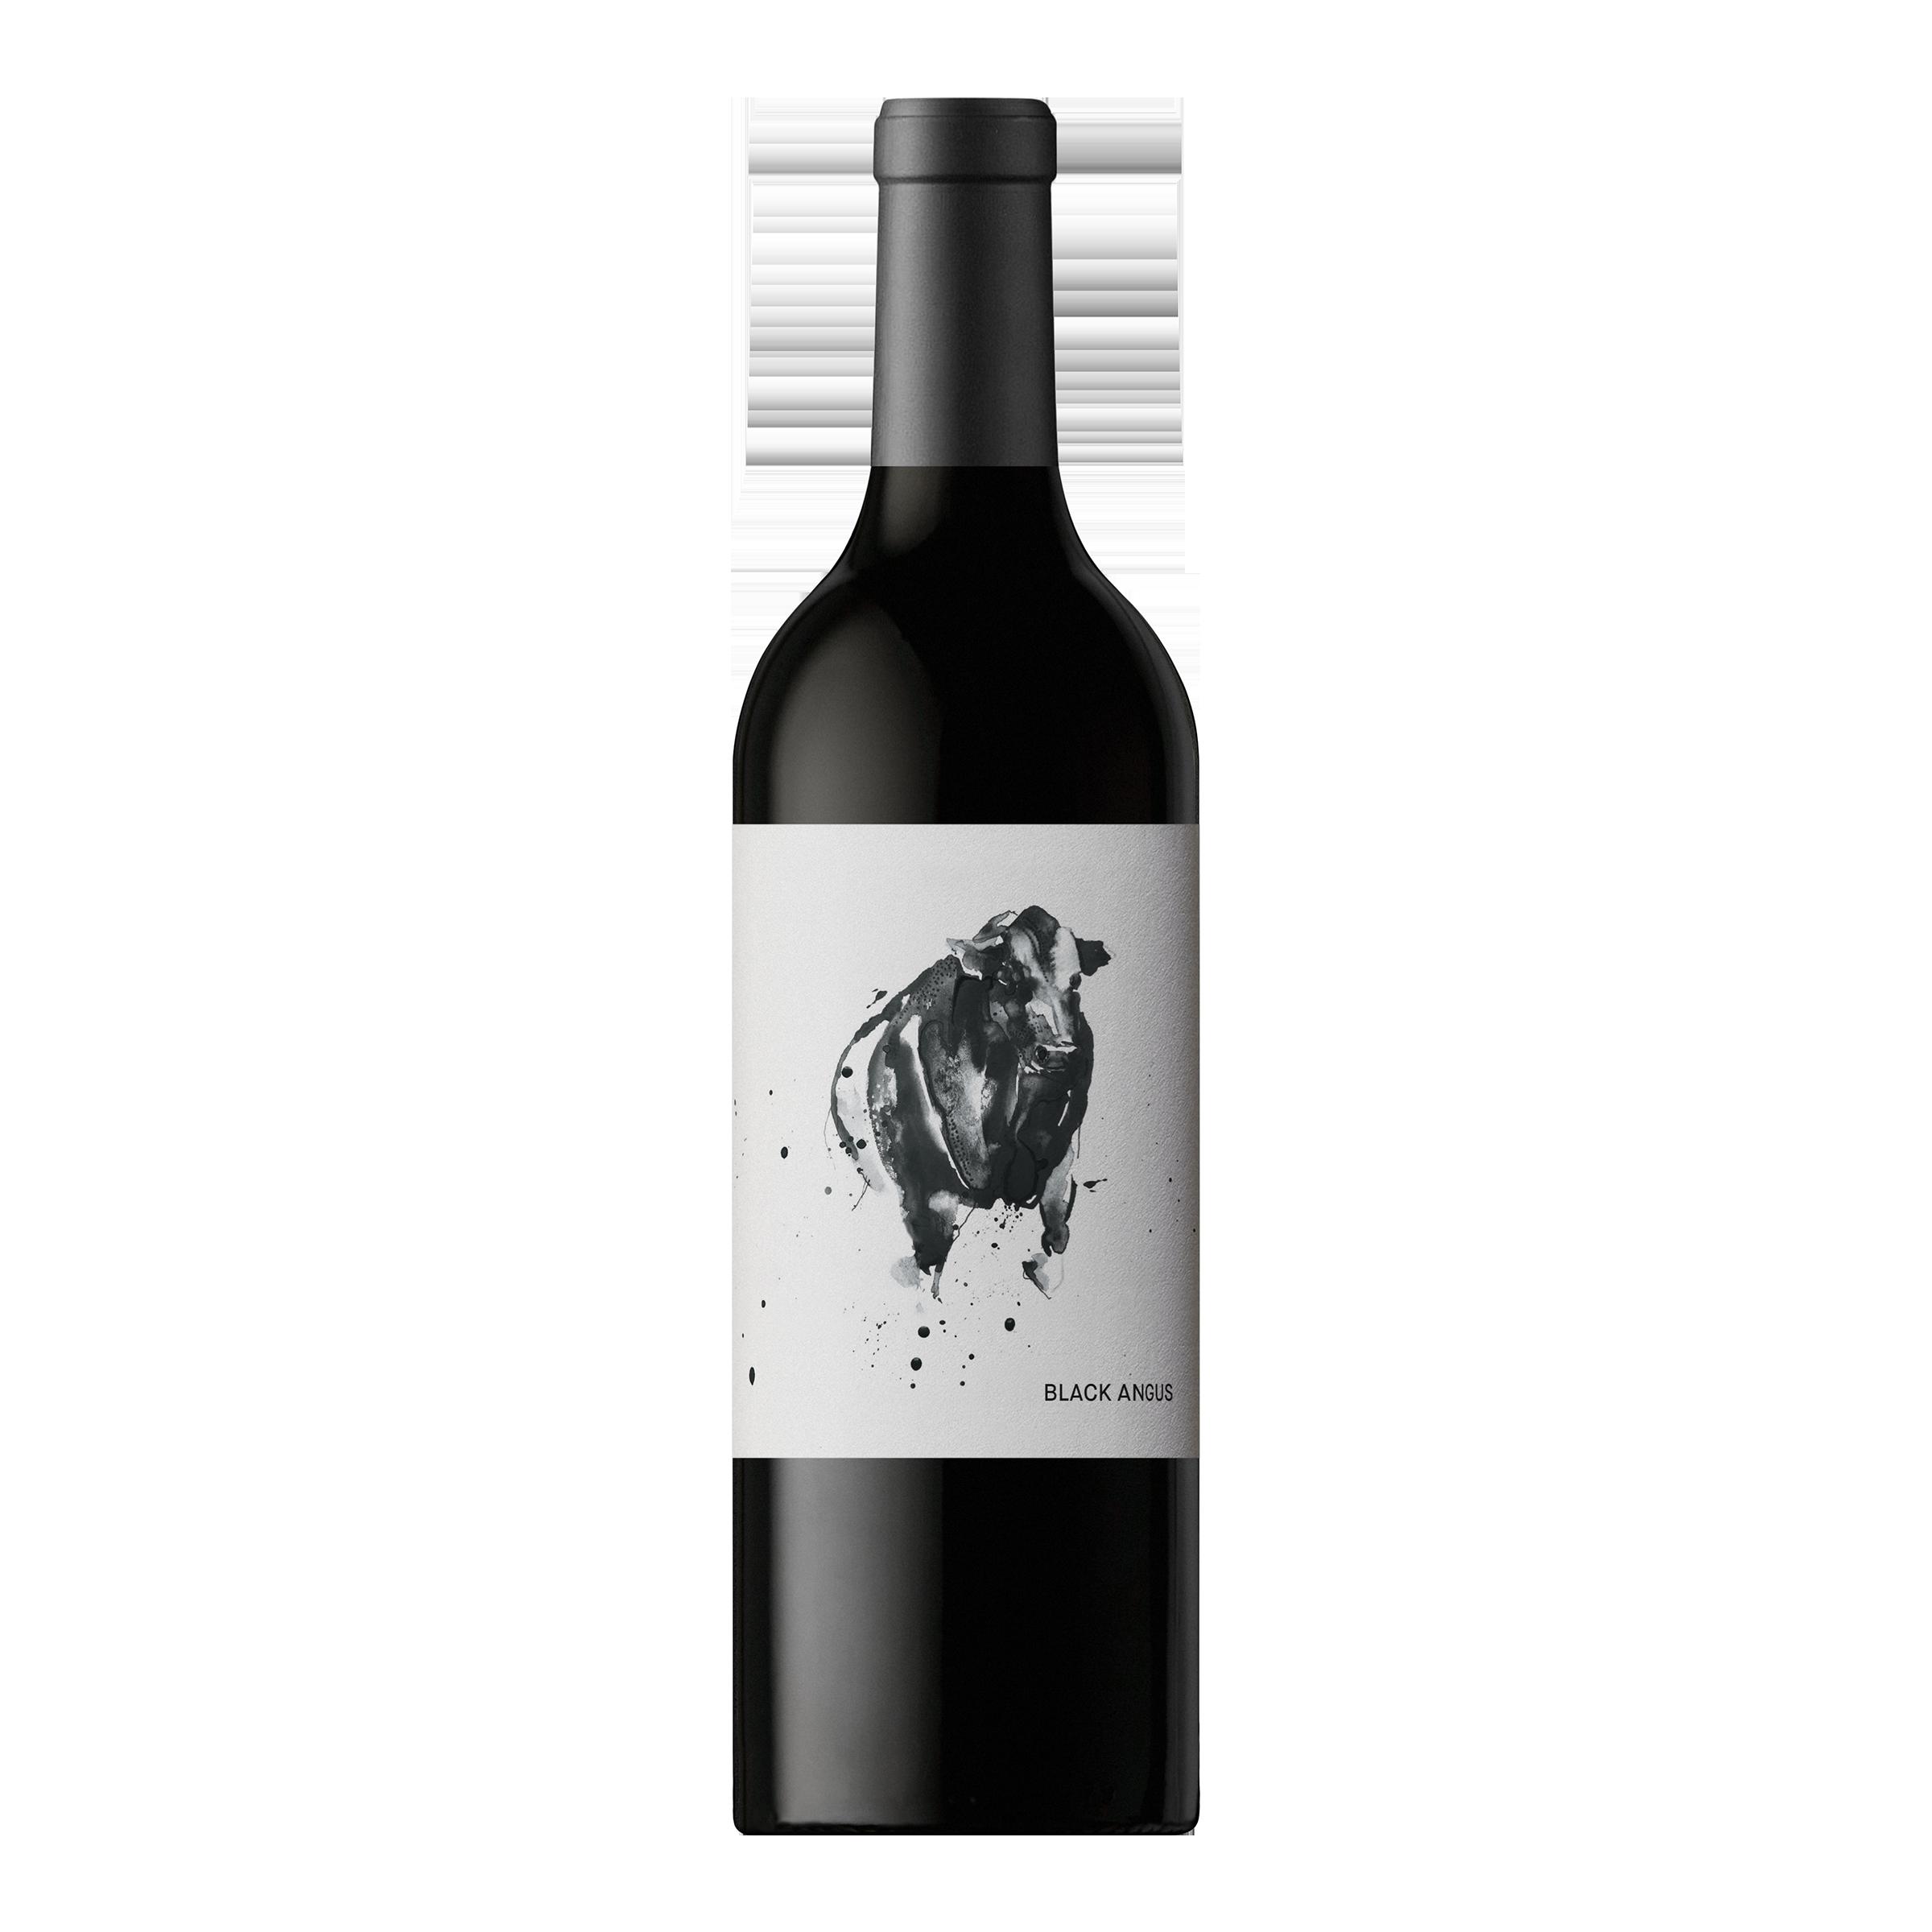 Black Angus Single Vineyard Cabernet Sauvignon